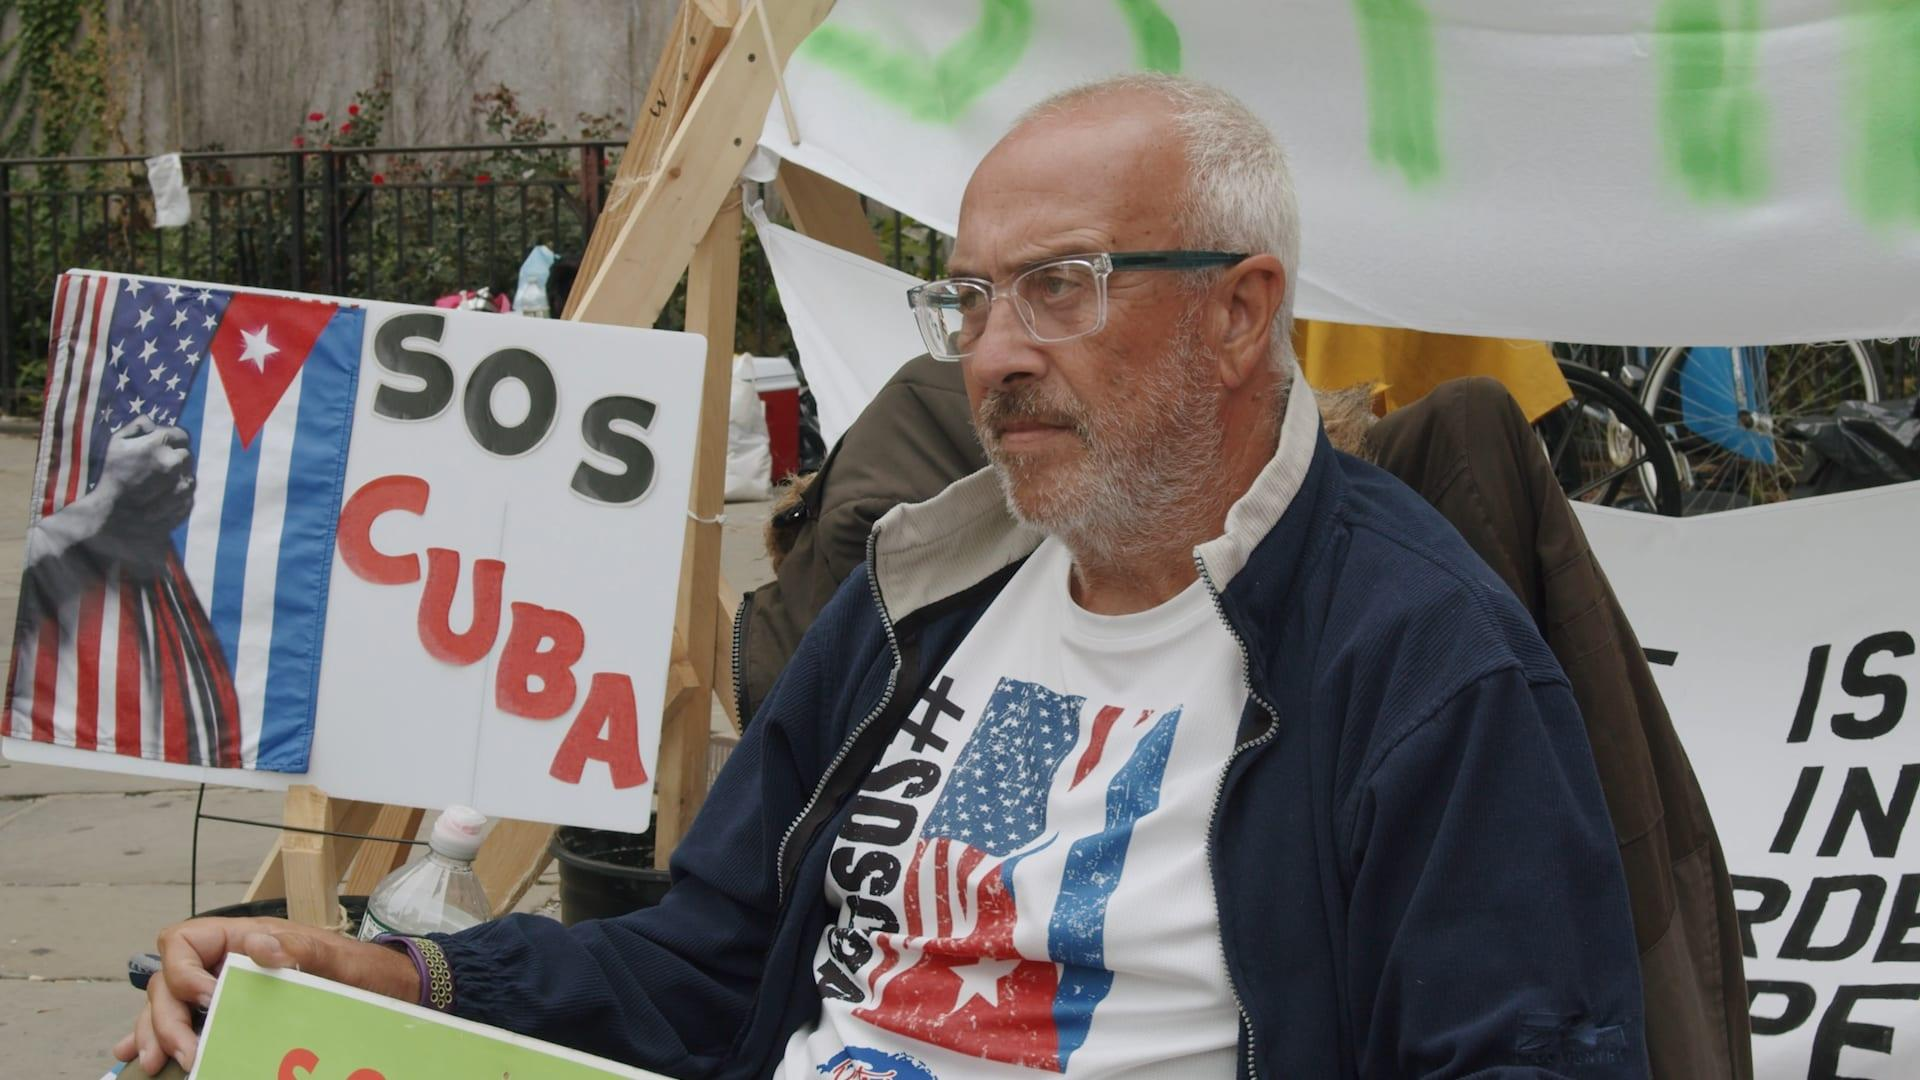 Demanding U.N. action, a man's hunger strike focuses attention on Cuba